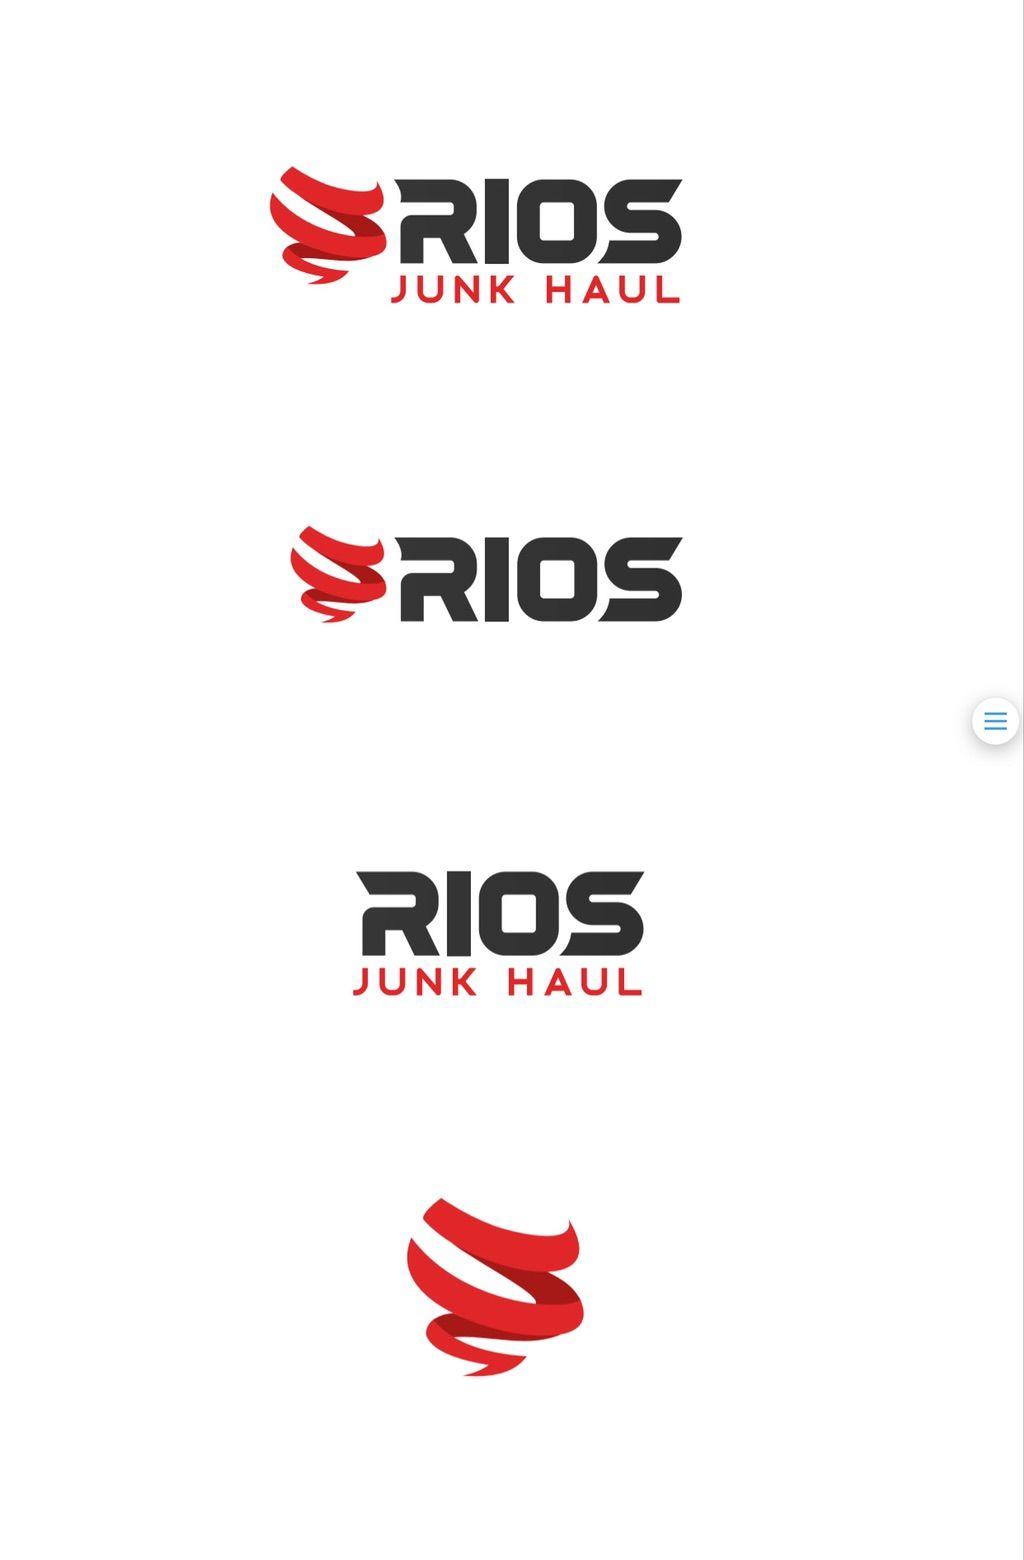 Rios Junk Haul